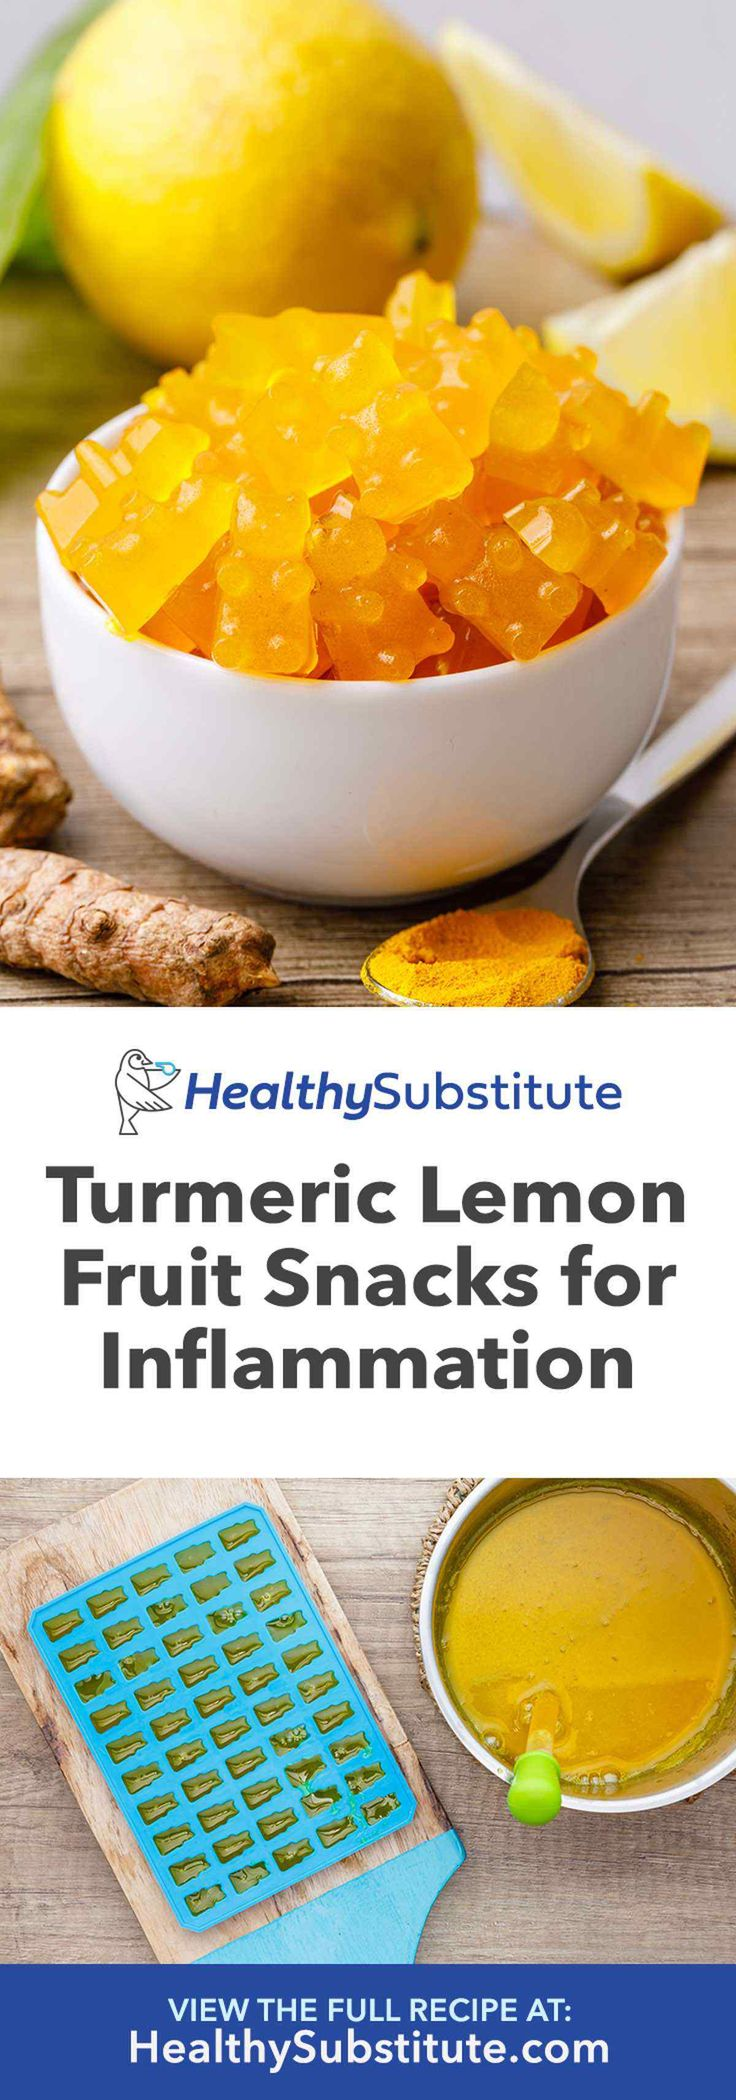 Anti-Inflammatory Turmeric Lemon Fruit Snacks – Healthy Substitute